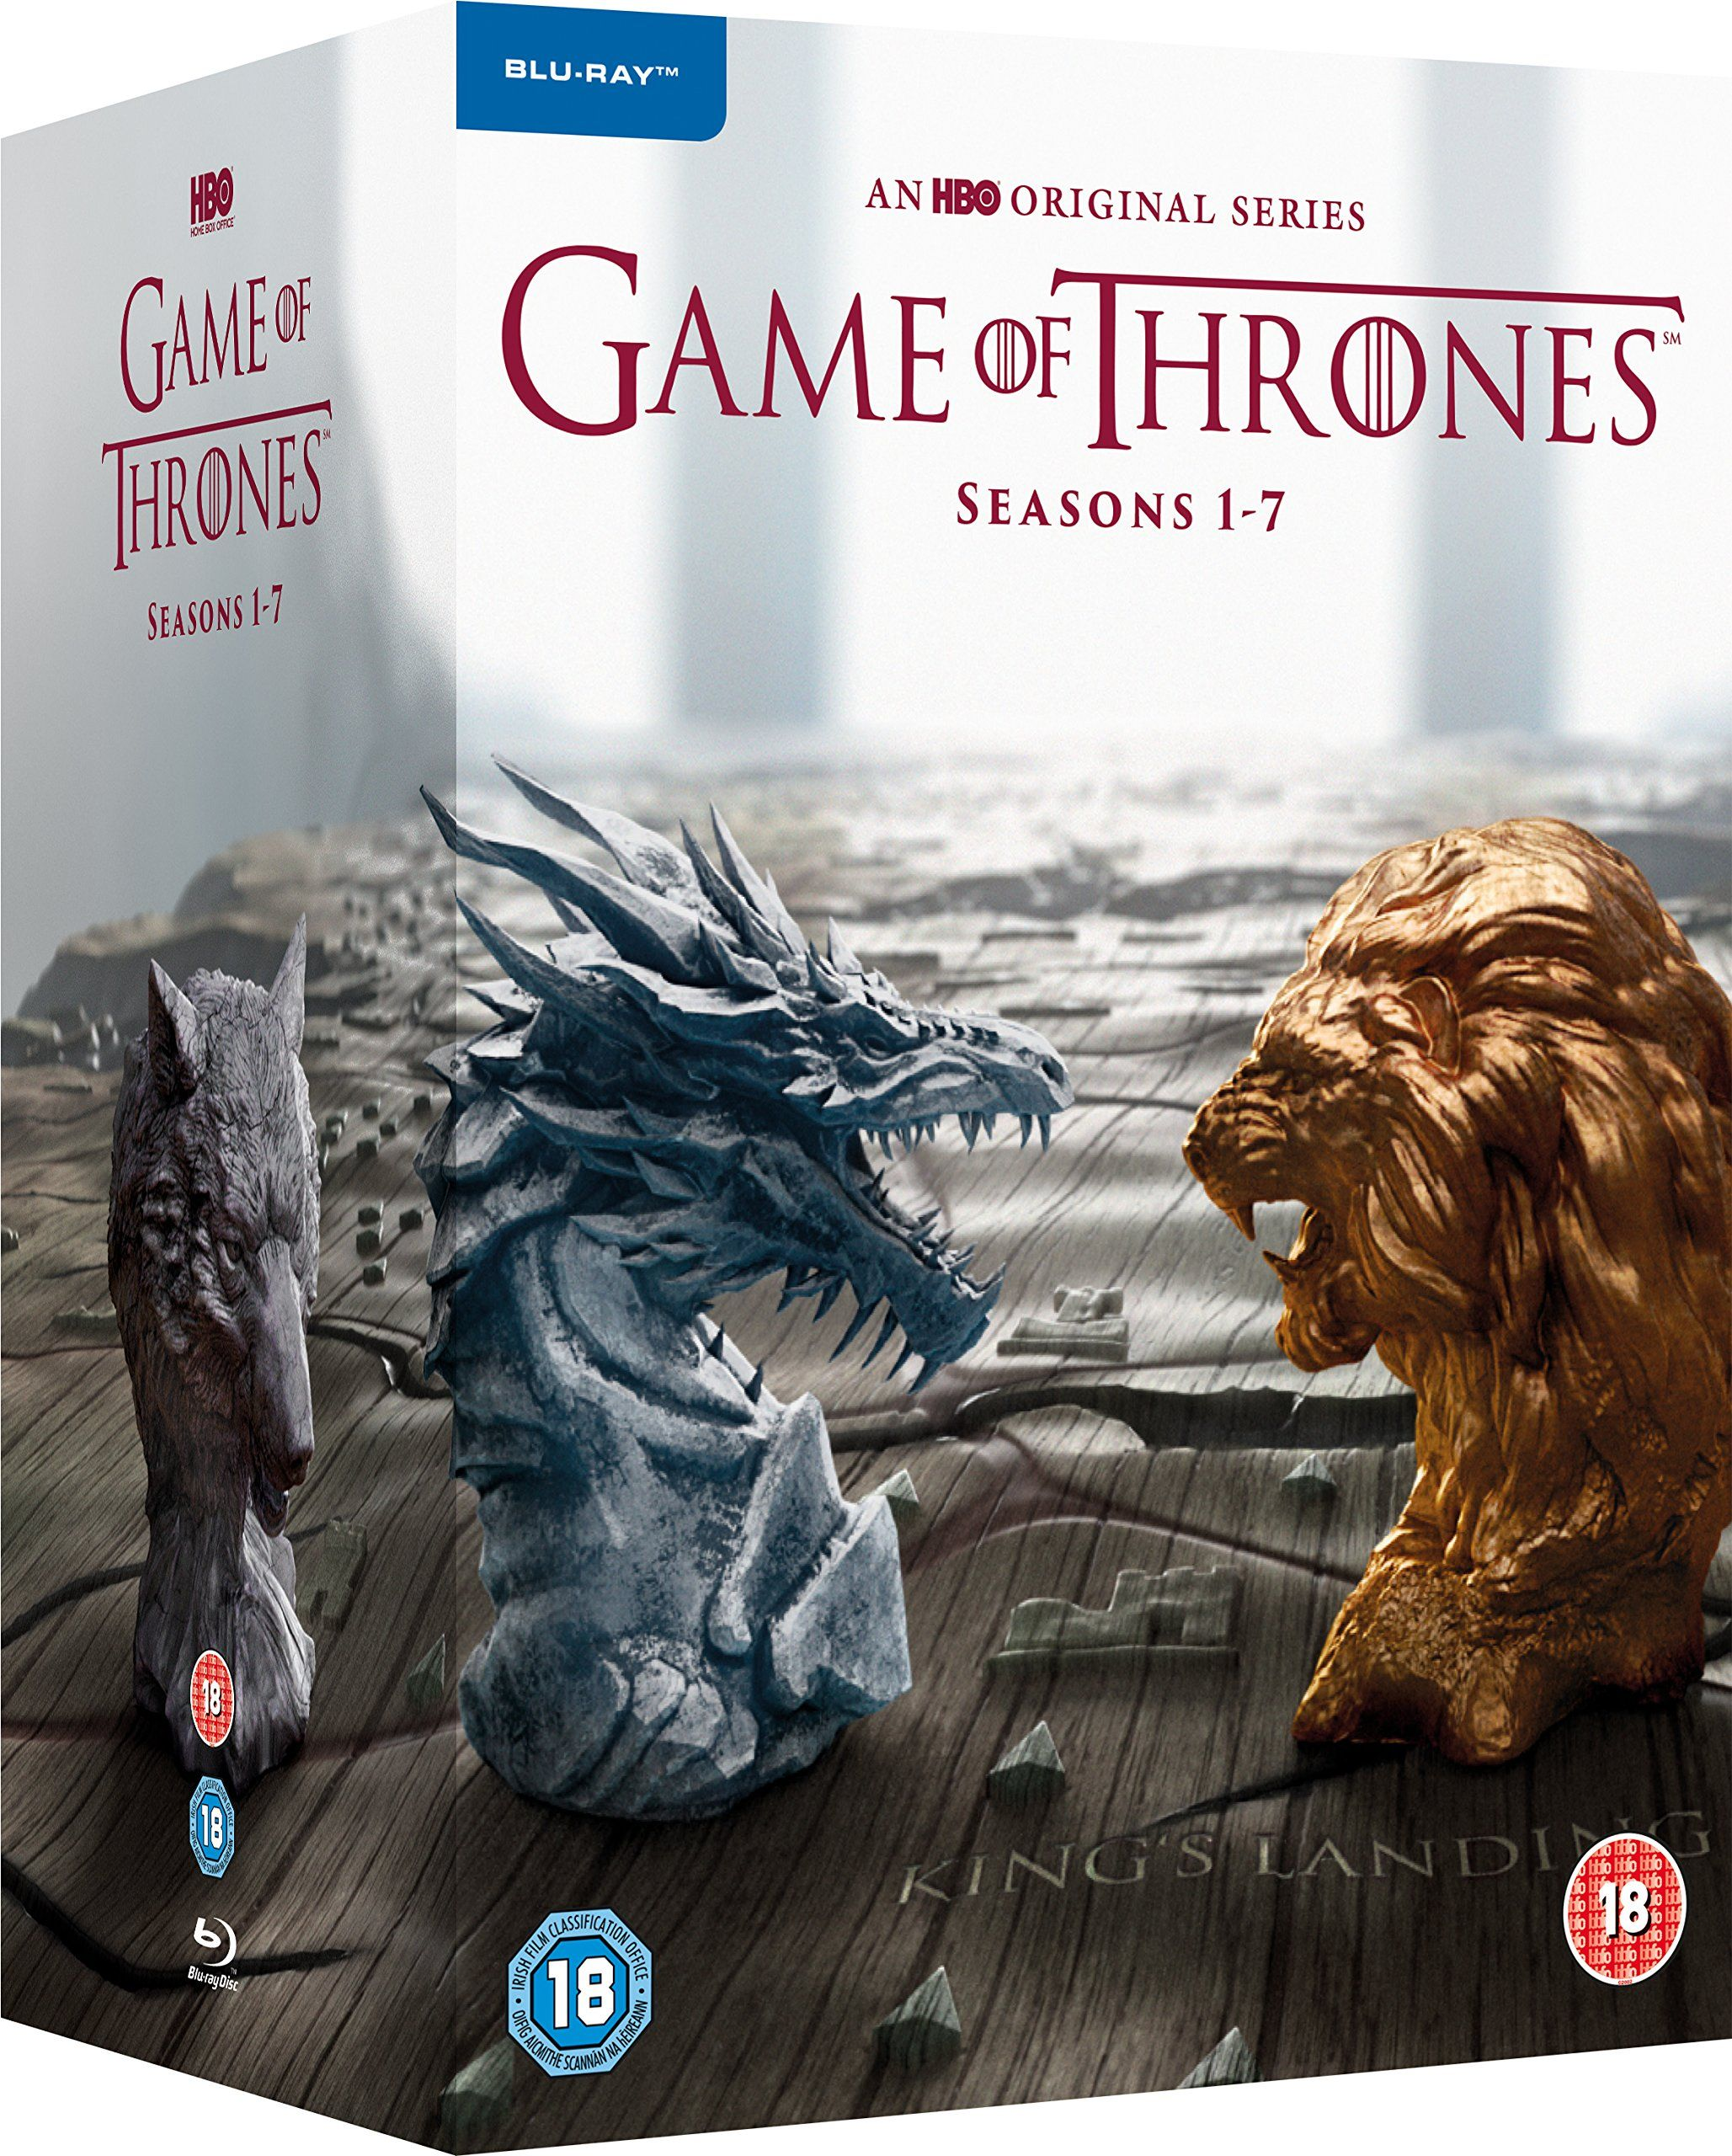 Game of Thrones - Season 1-7 [Blu-ray] [2017] [Region Free